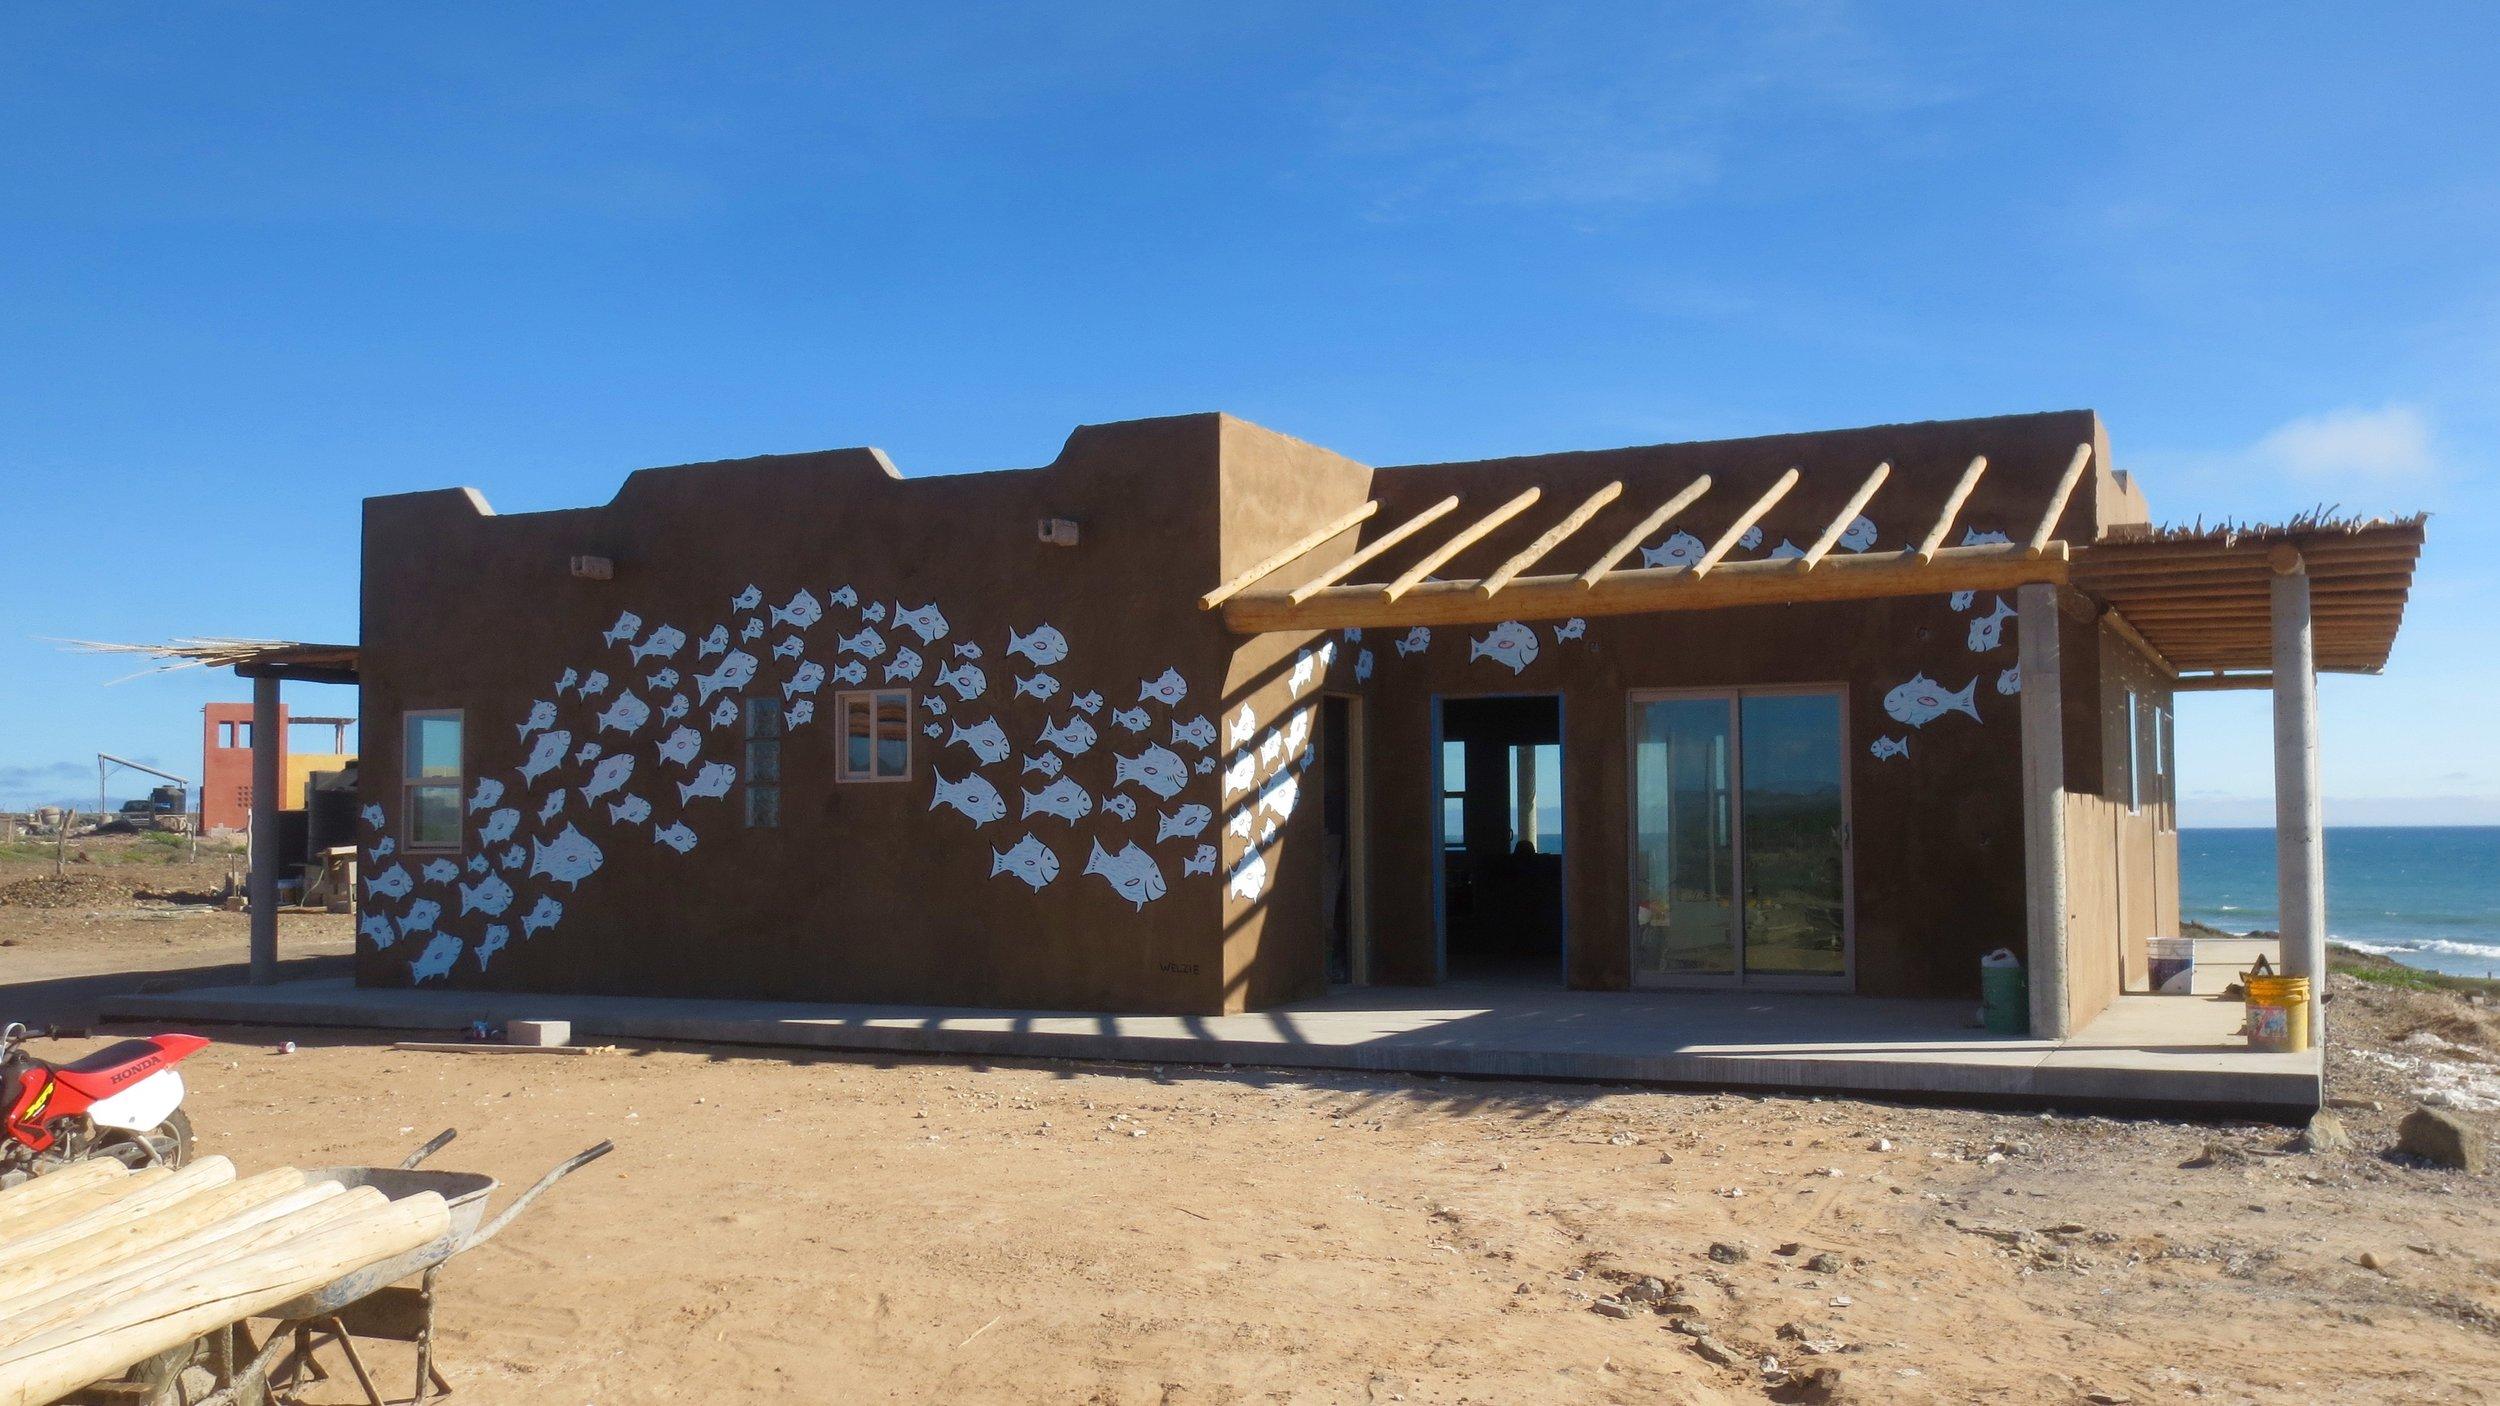 The House we painted in San Juanico, Baja California